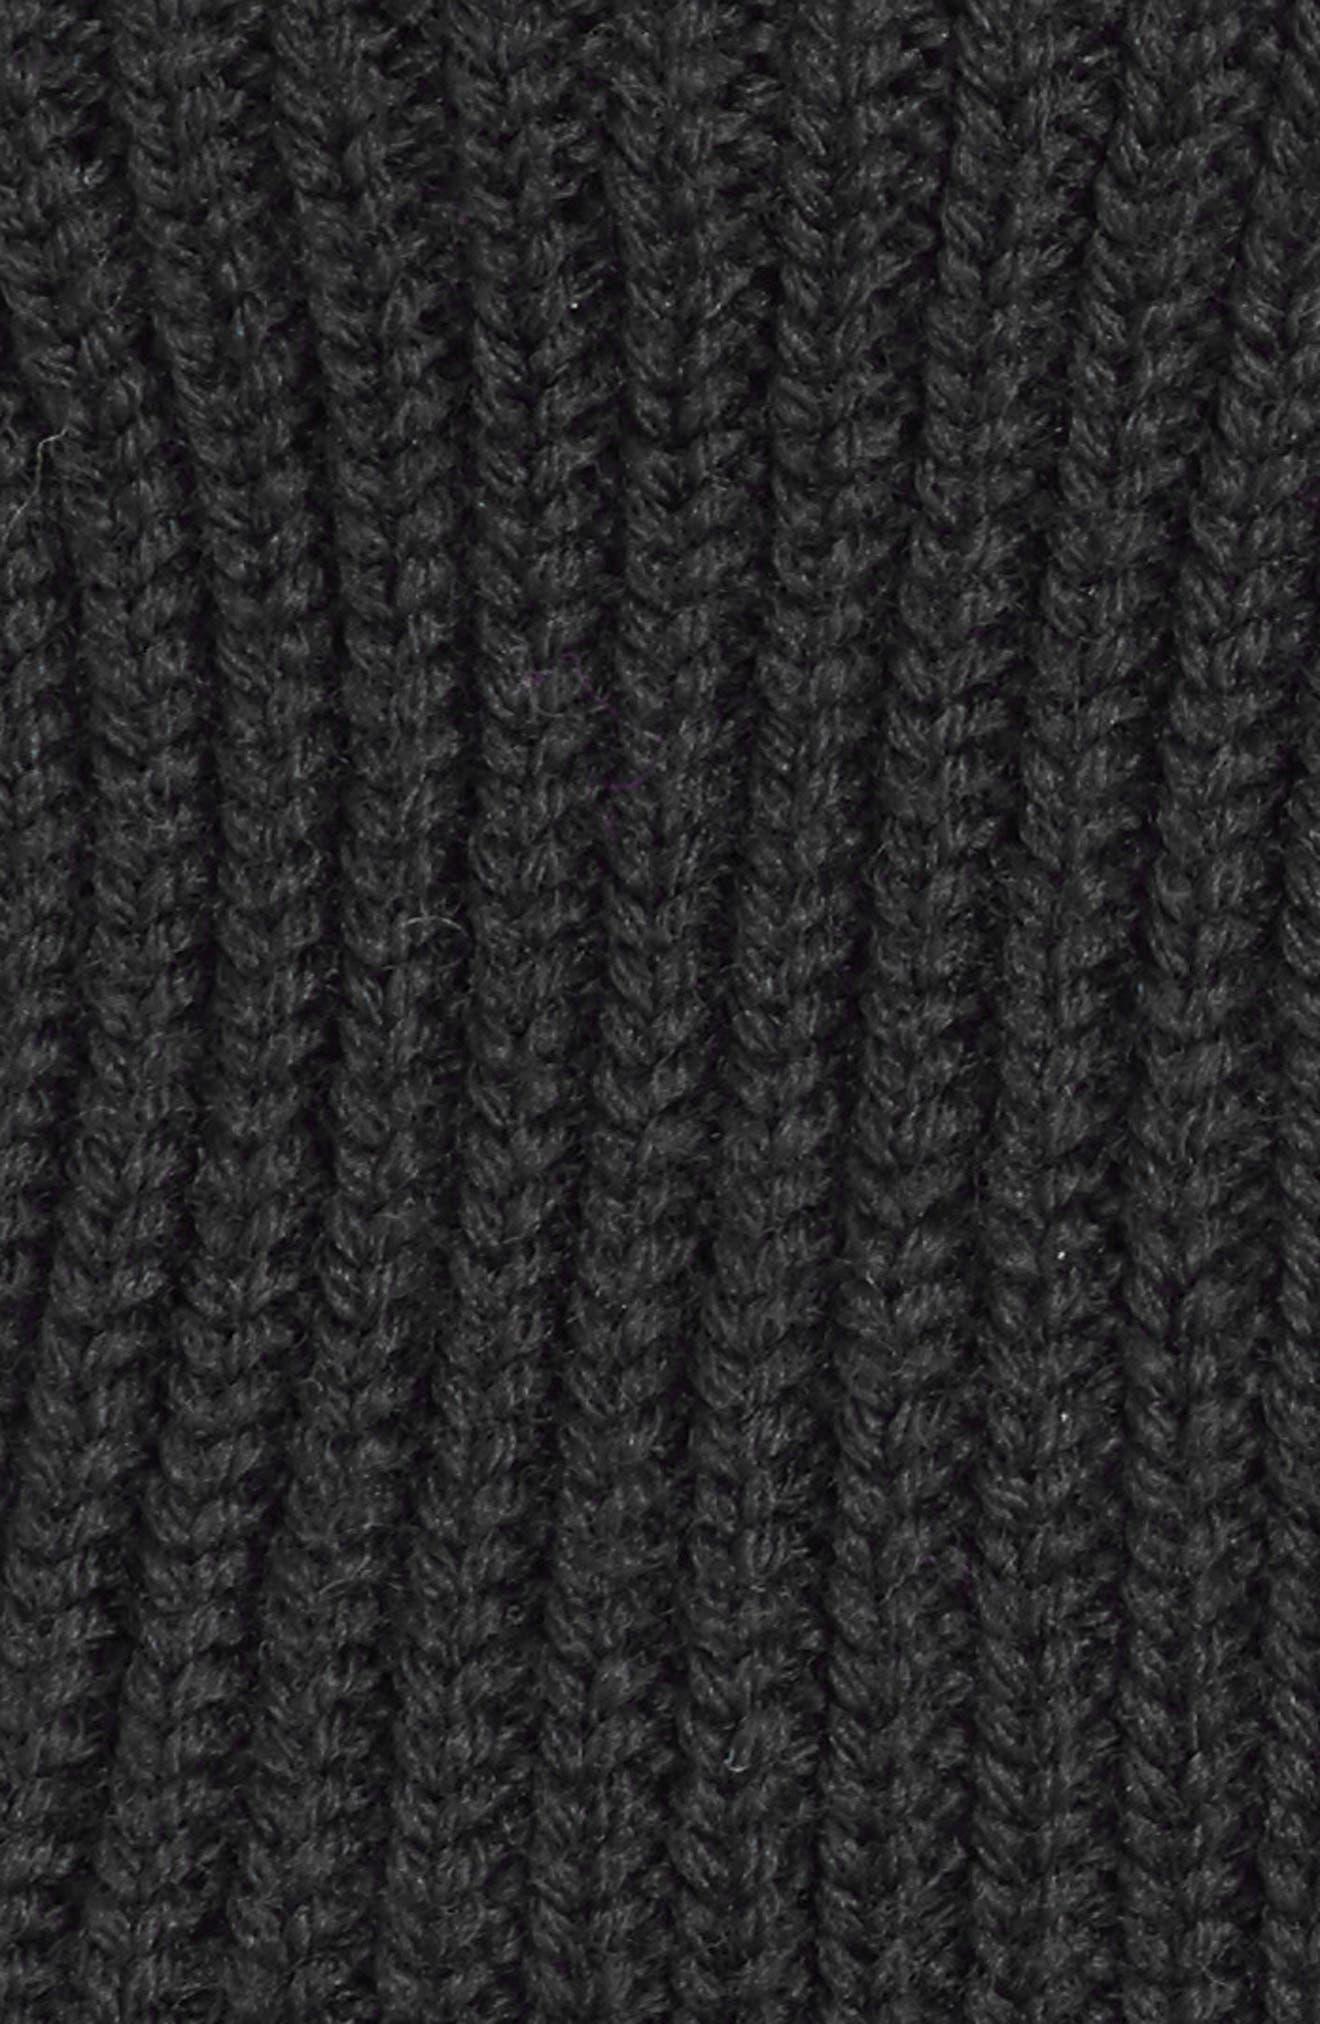 Guanti Wool Long Fingerless Gloves,                             Alternate thumbnail 3, color,                             Black